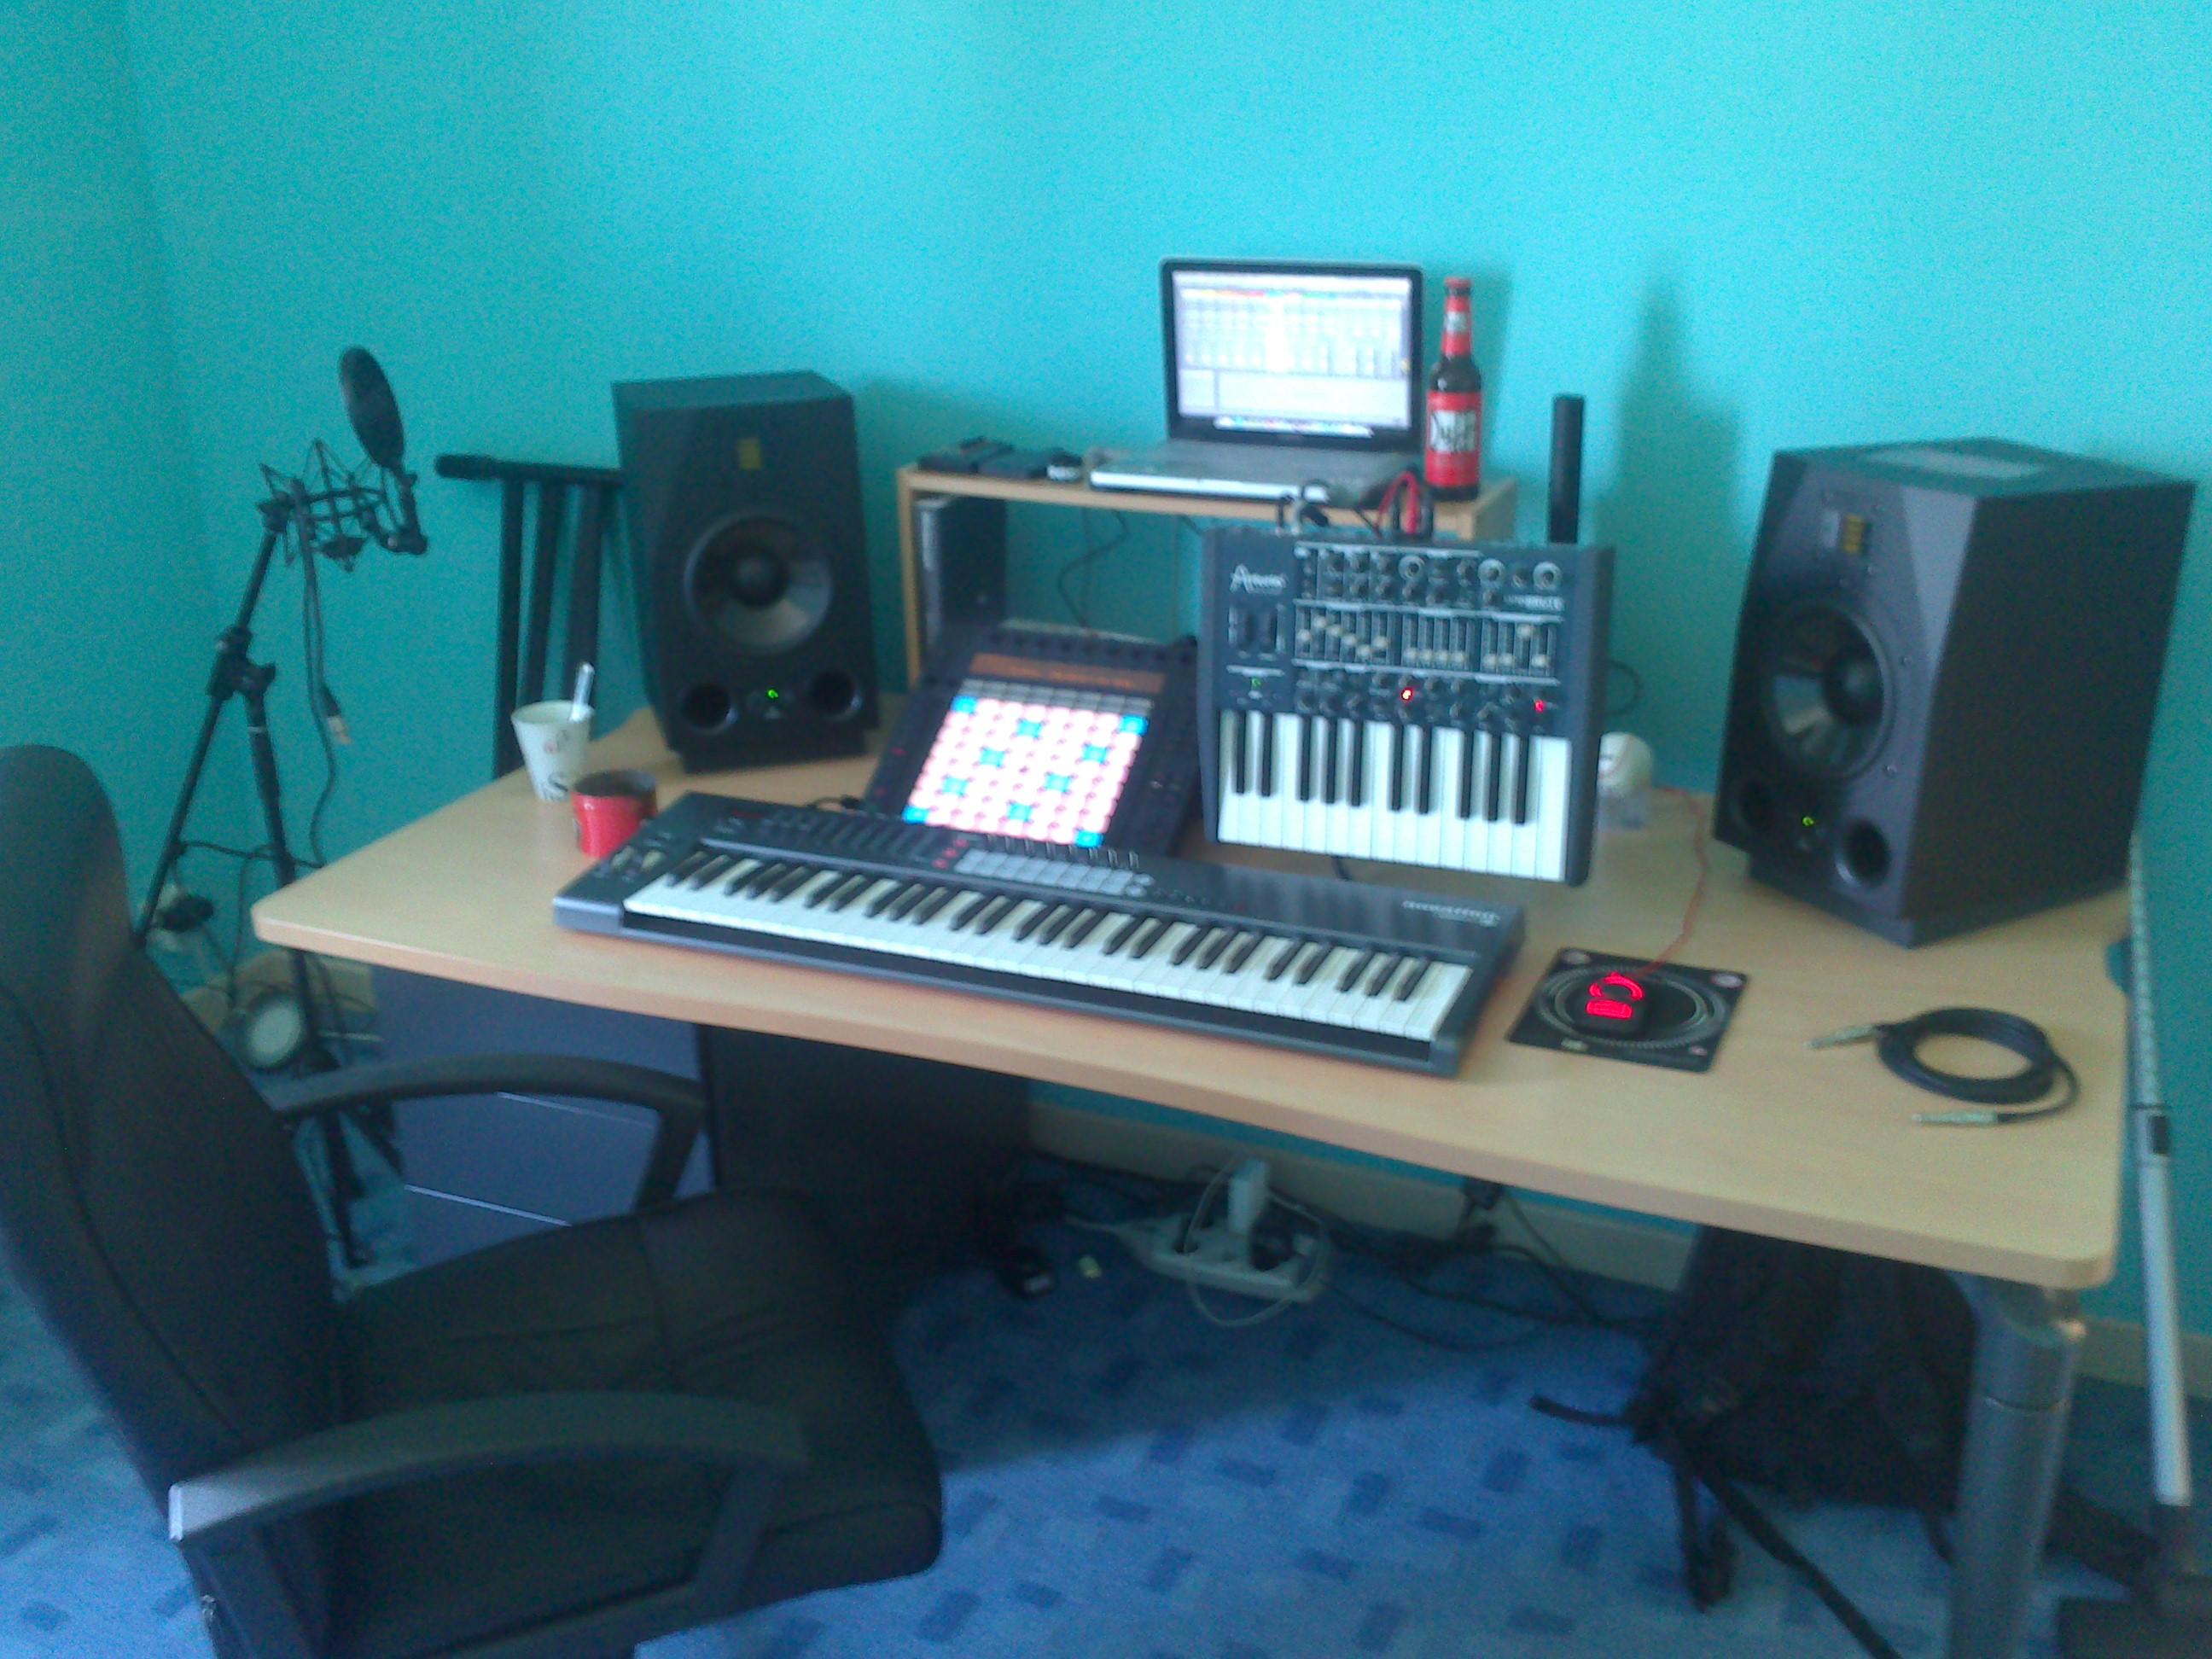 No name meuble rack bureau studio image 1000108 for Bureau home studio